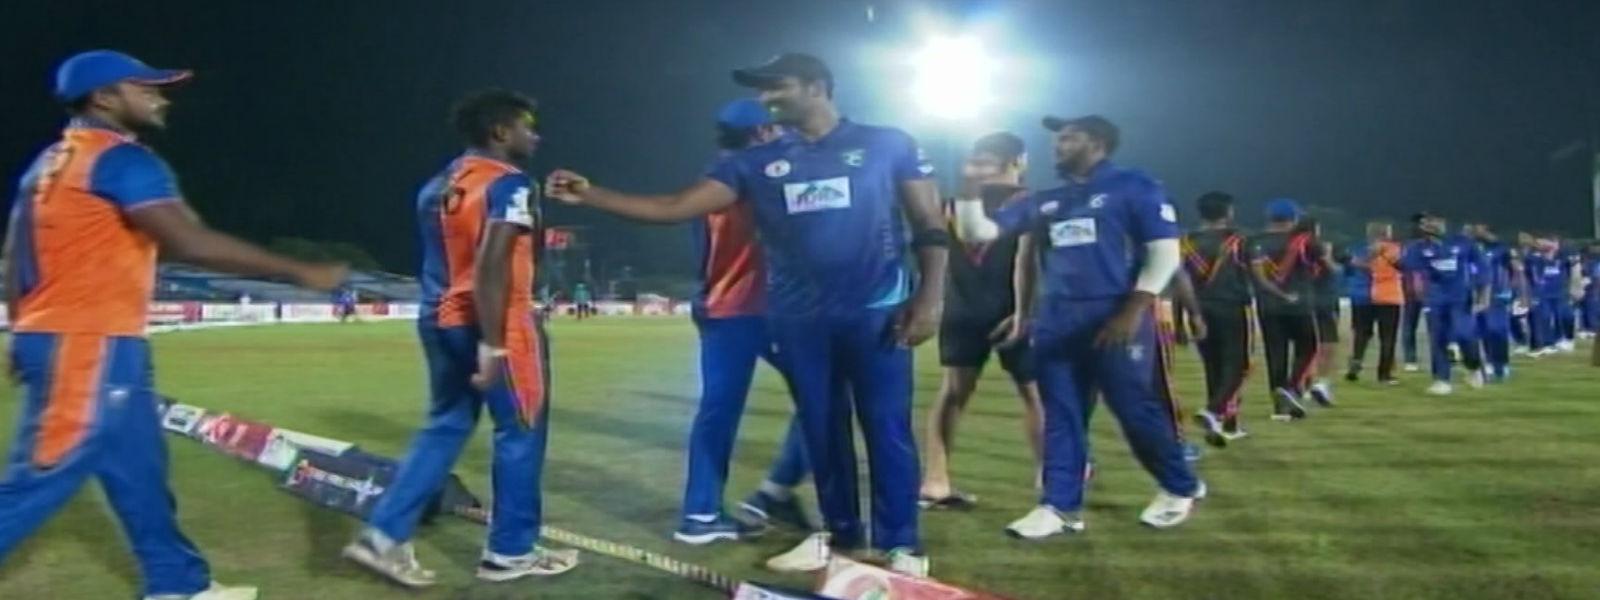 LPL தொடரில் Jaffna Stallions அணி 54 ஓட்டங்களால் வெற்றி